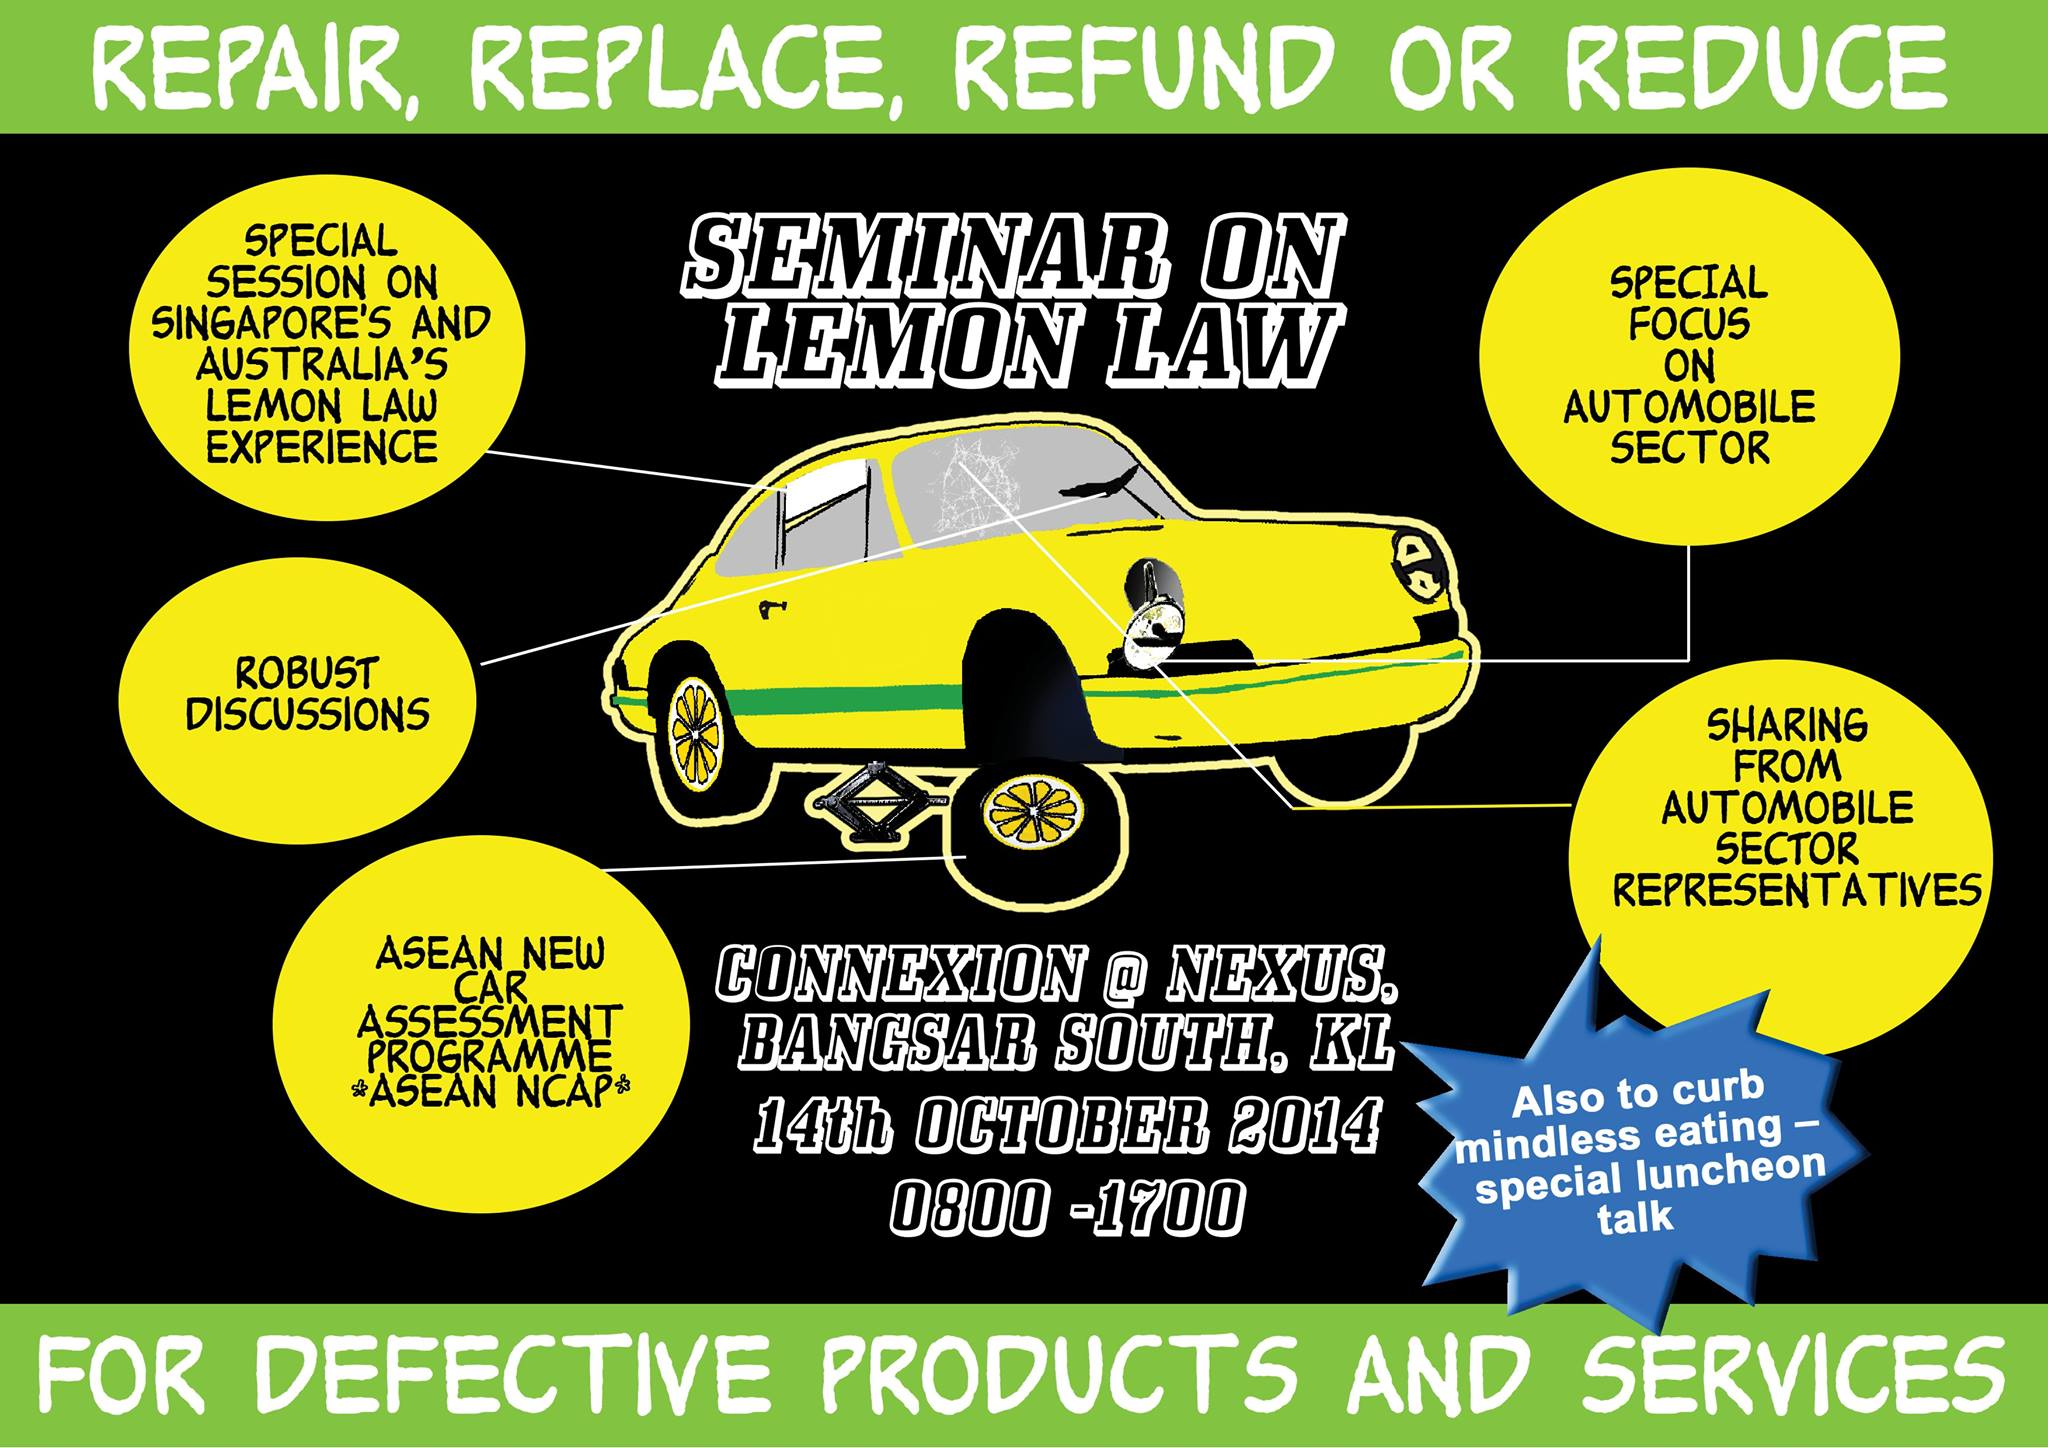 Establish Lemon Laws To Protect Car Buyers Standards Users